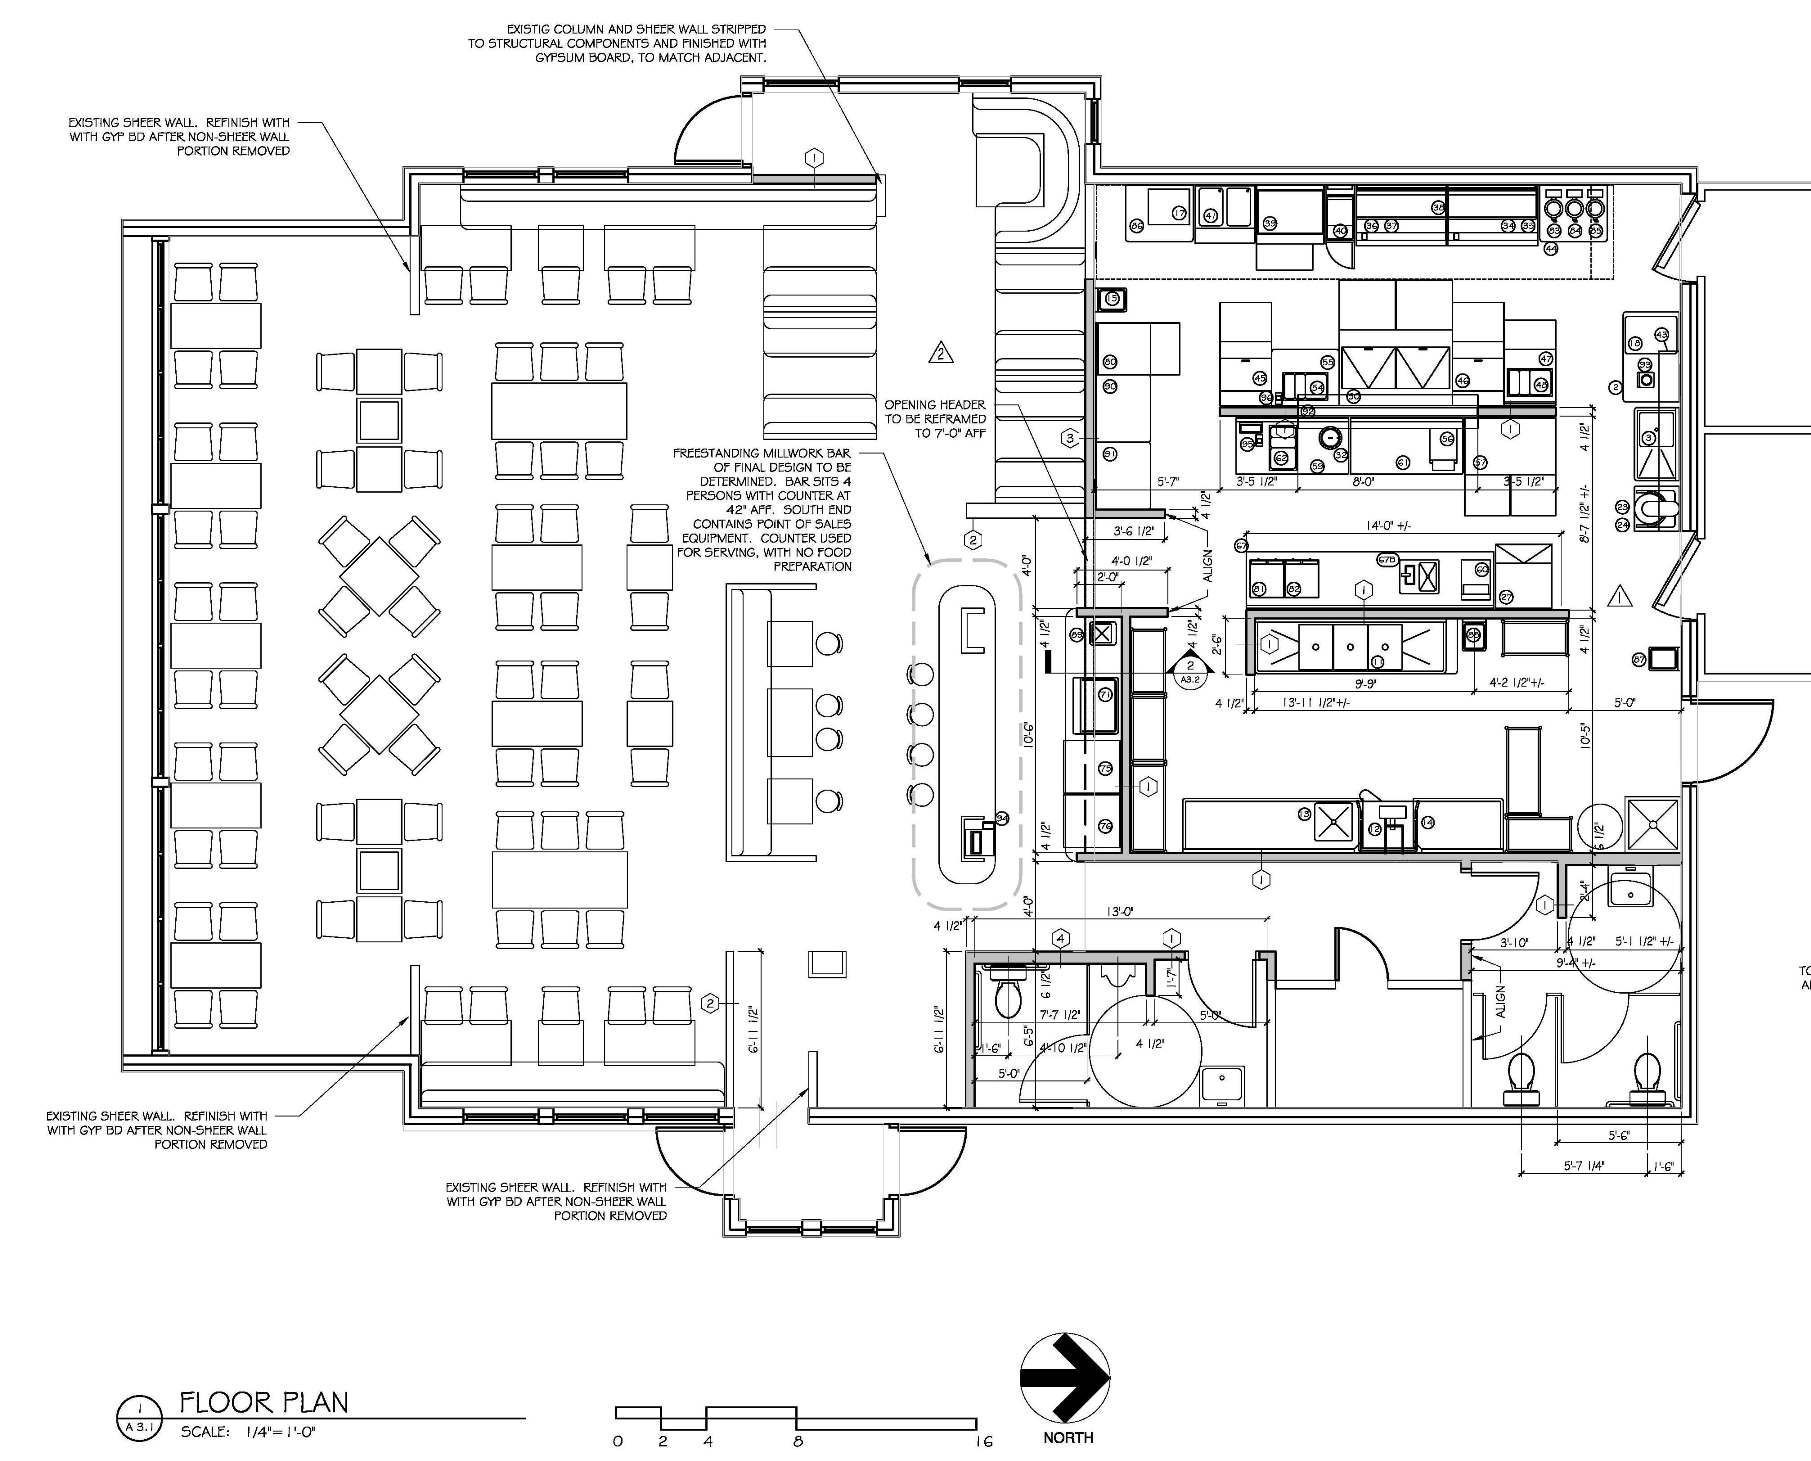 Restaurant Cafe And Bar Floor Plan